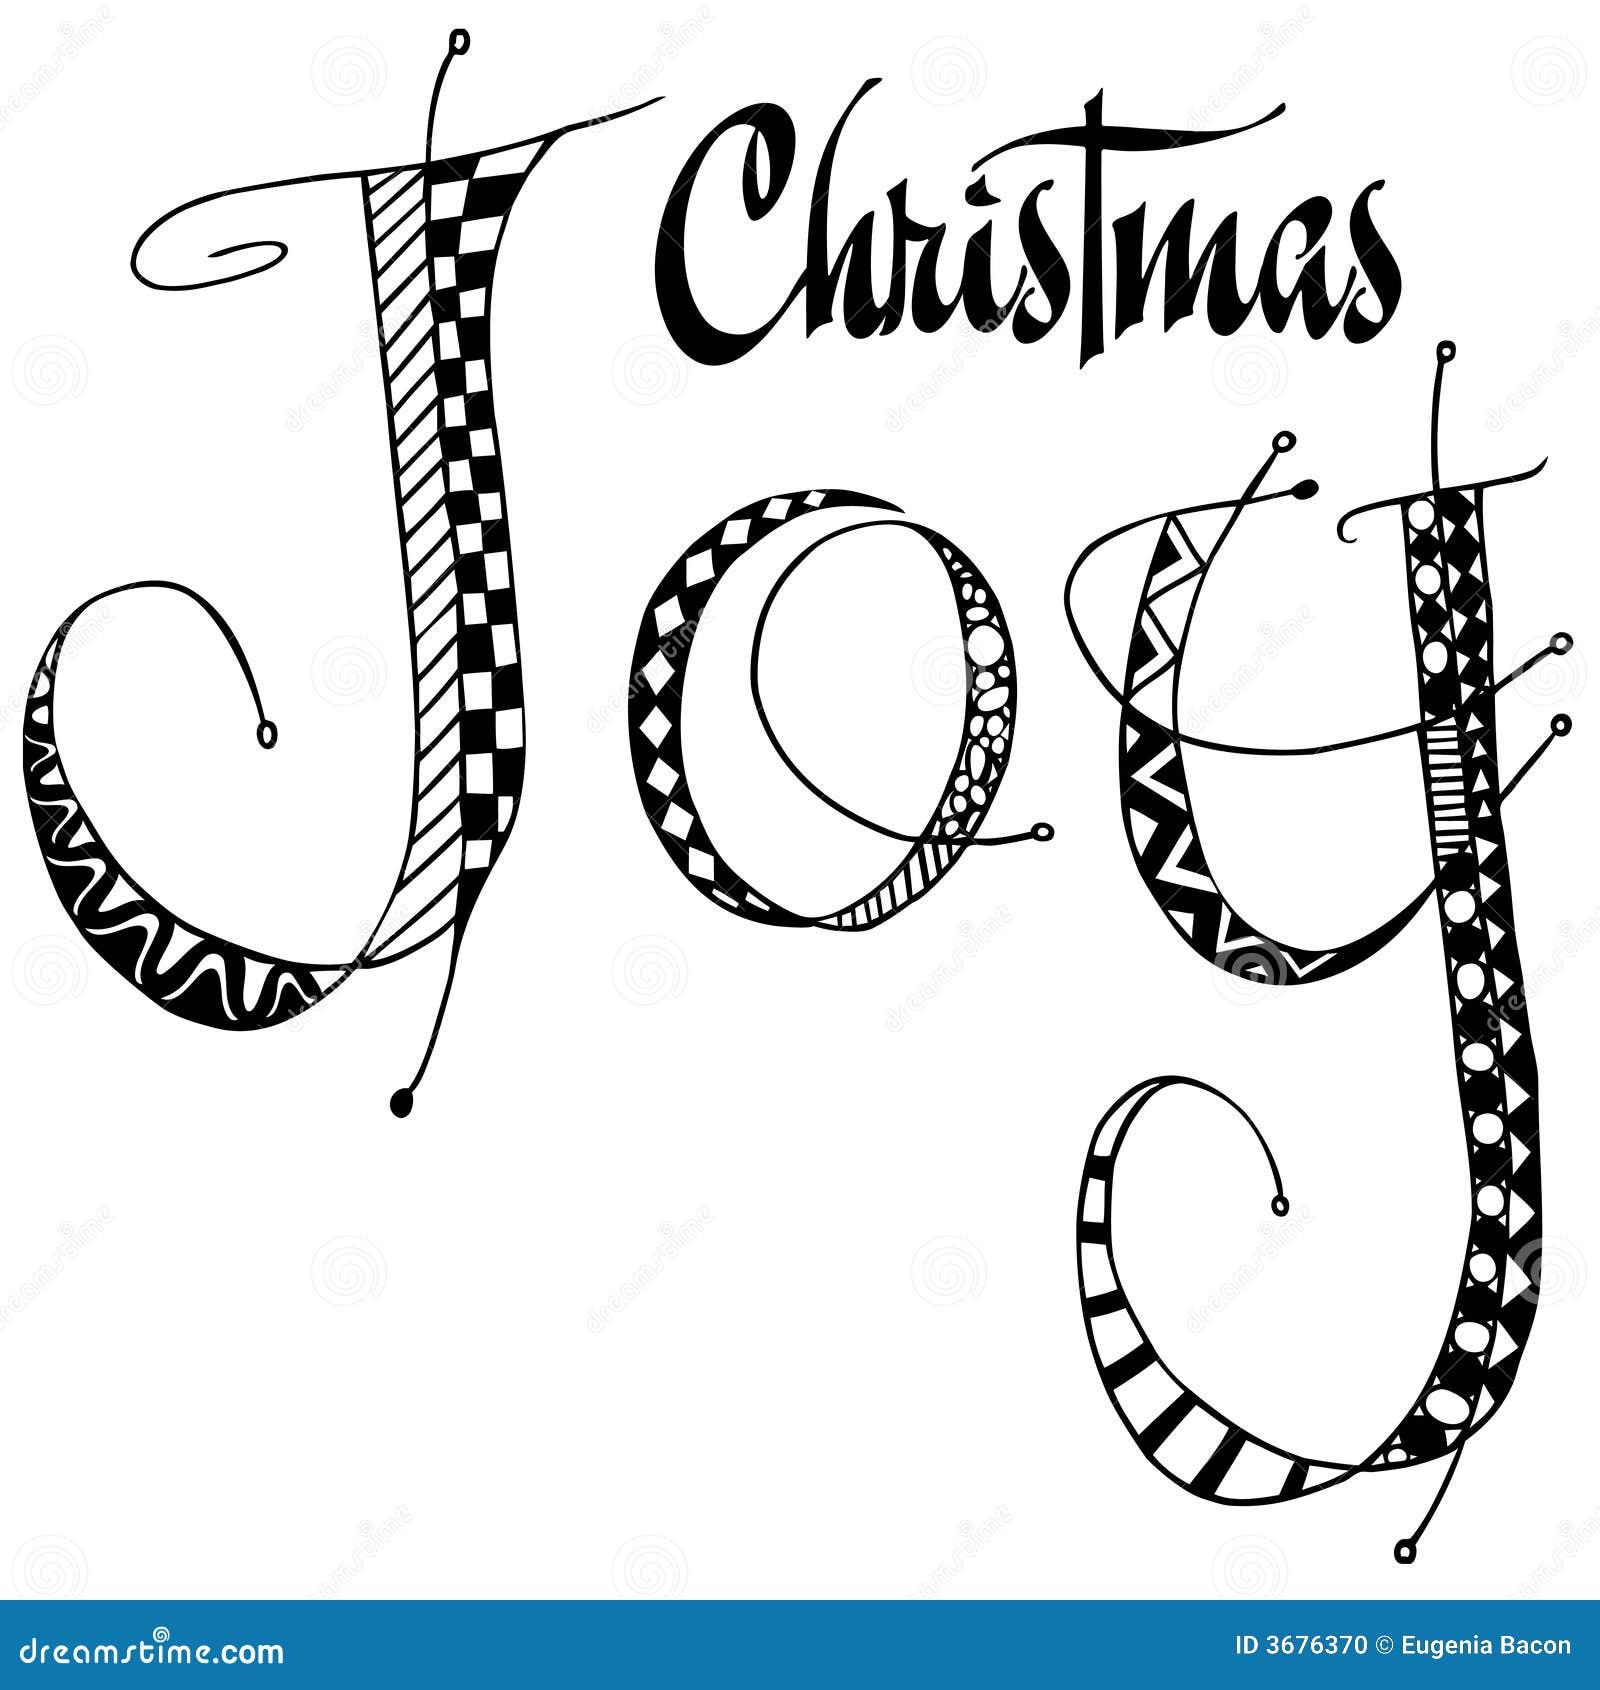 Fancy Merry Christmas Clip Art Words